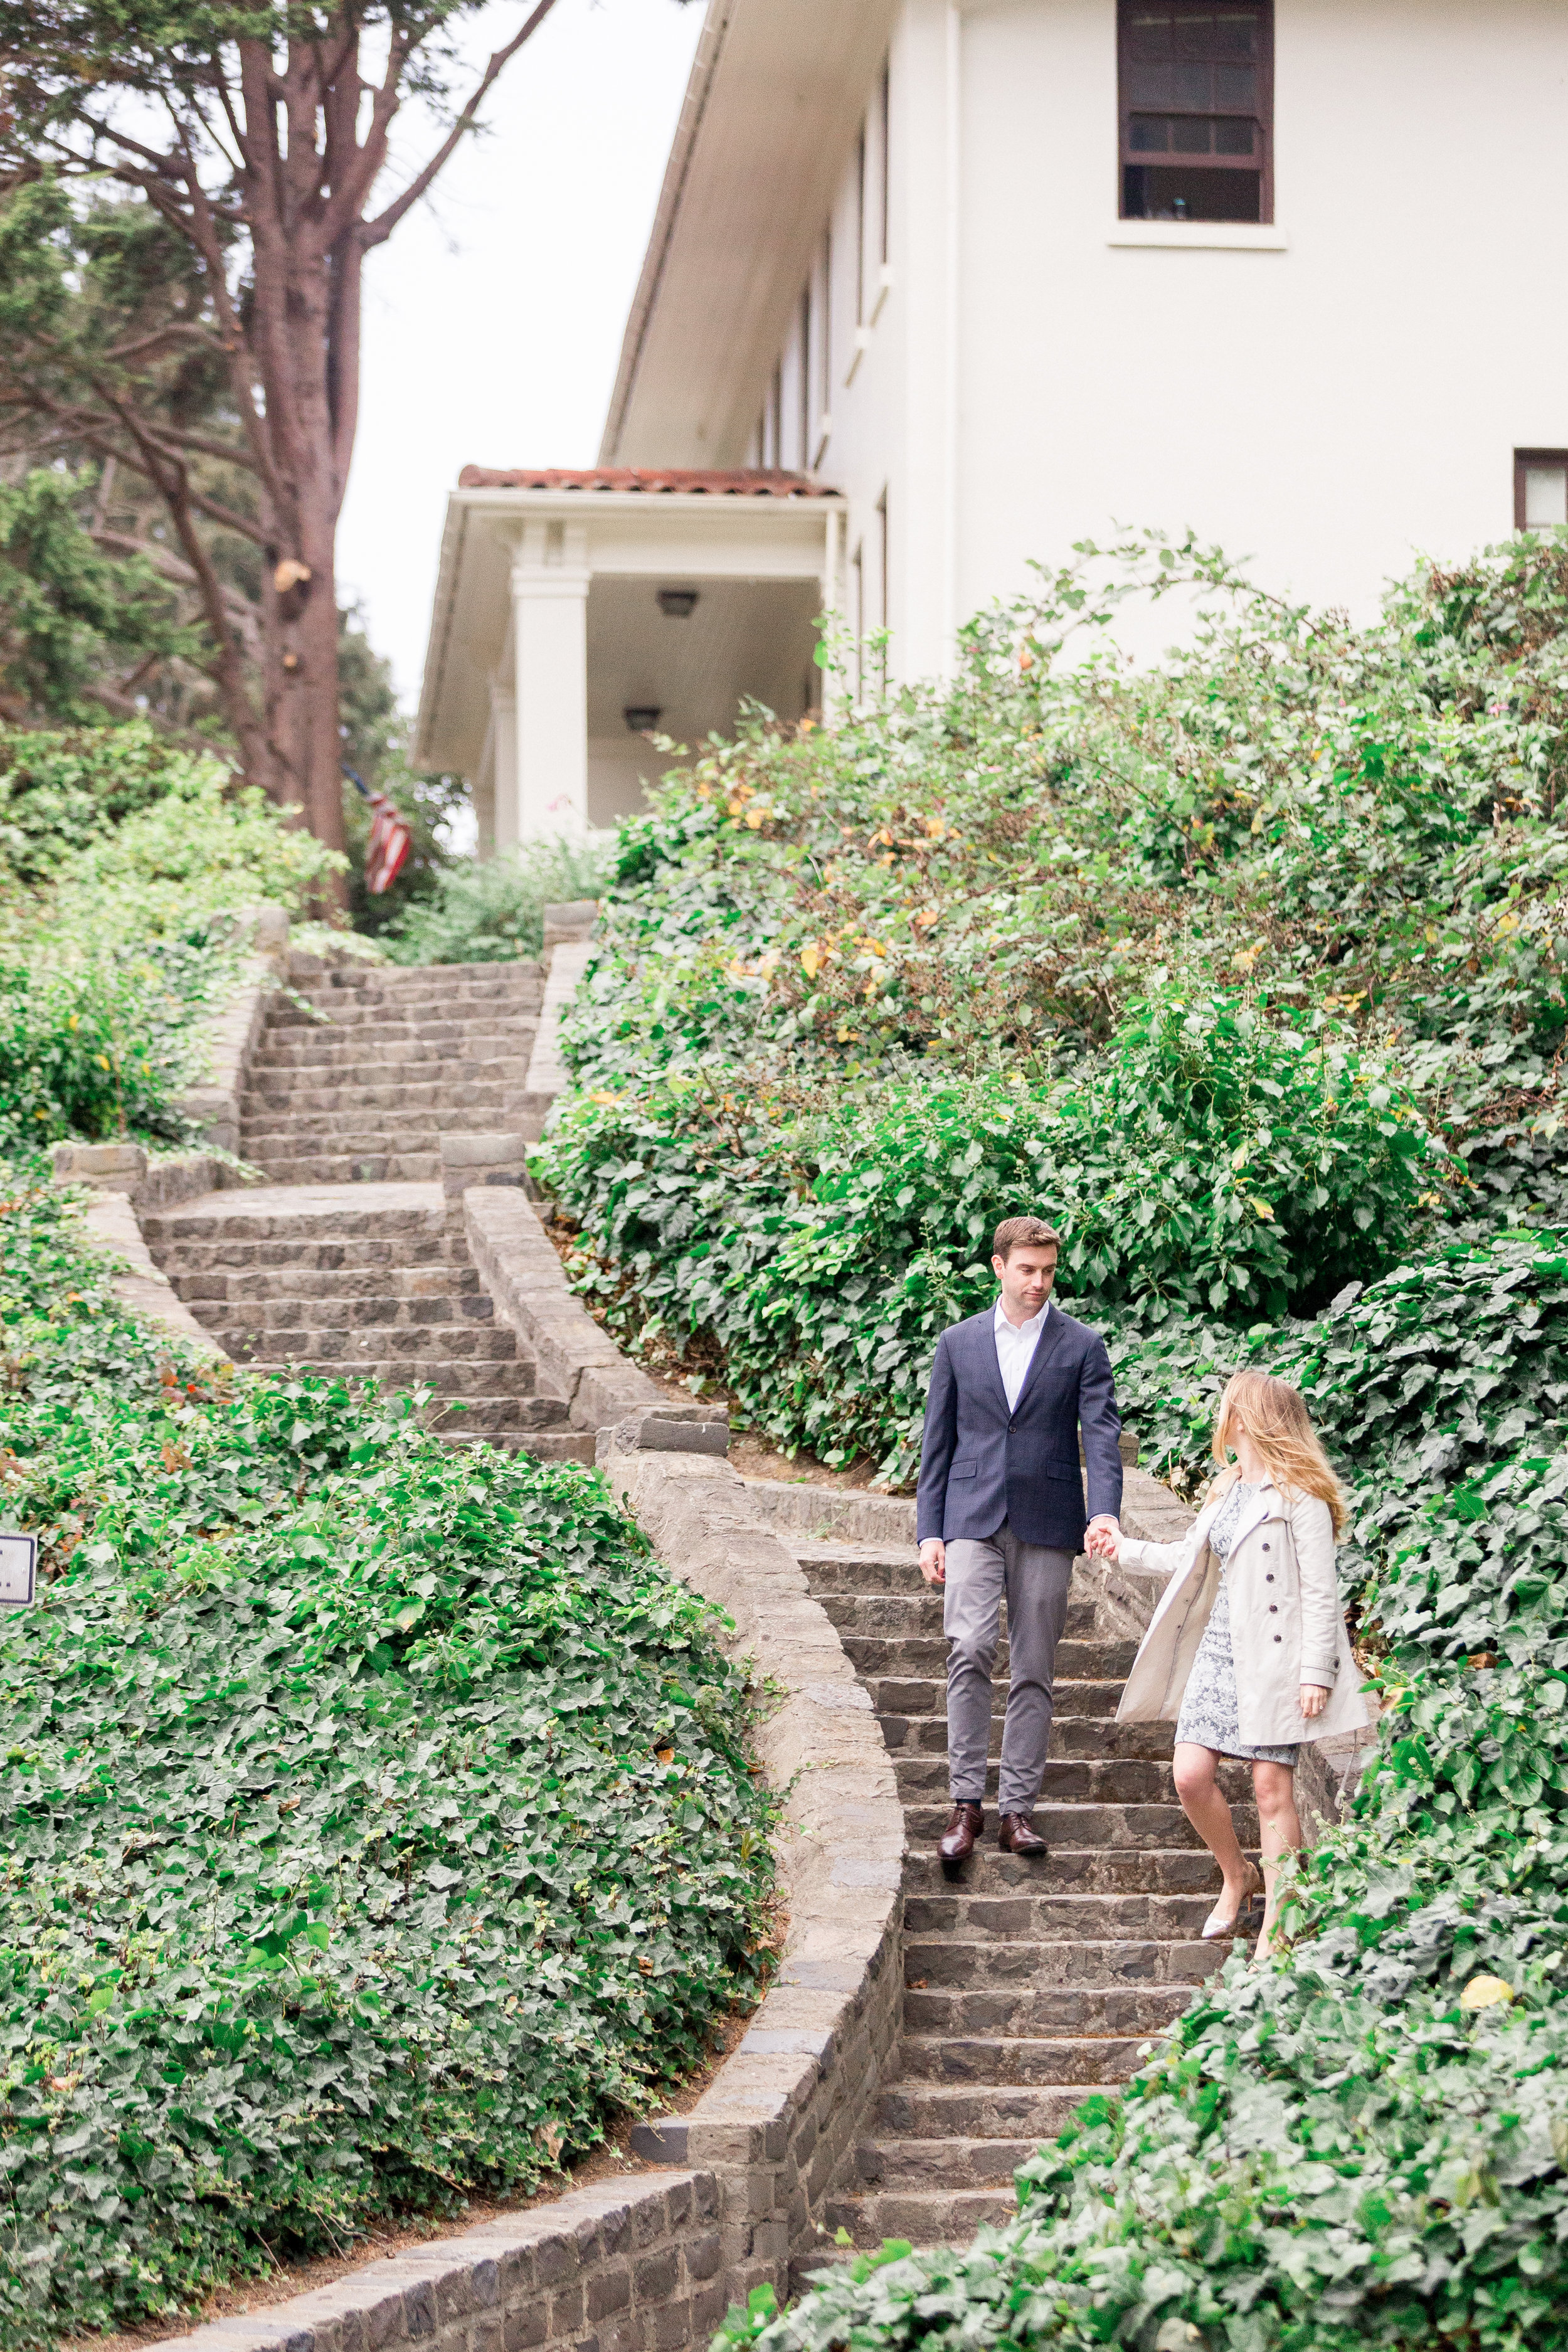 Lovers-Lane-San-Francisco-Engagement-Photos-82.jpg